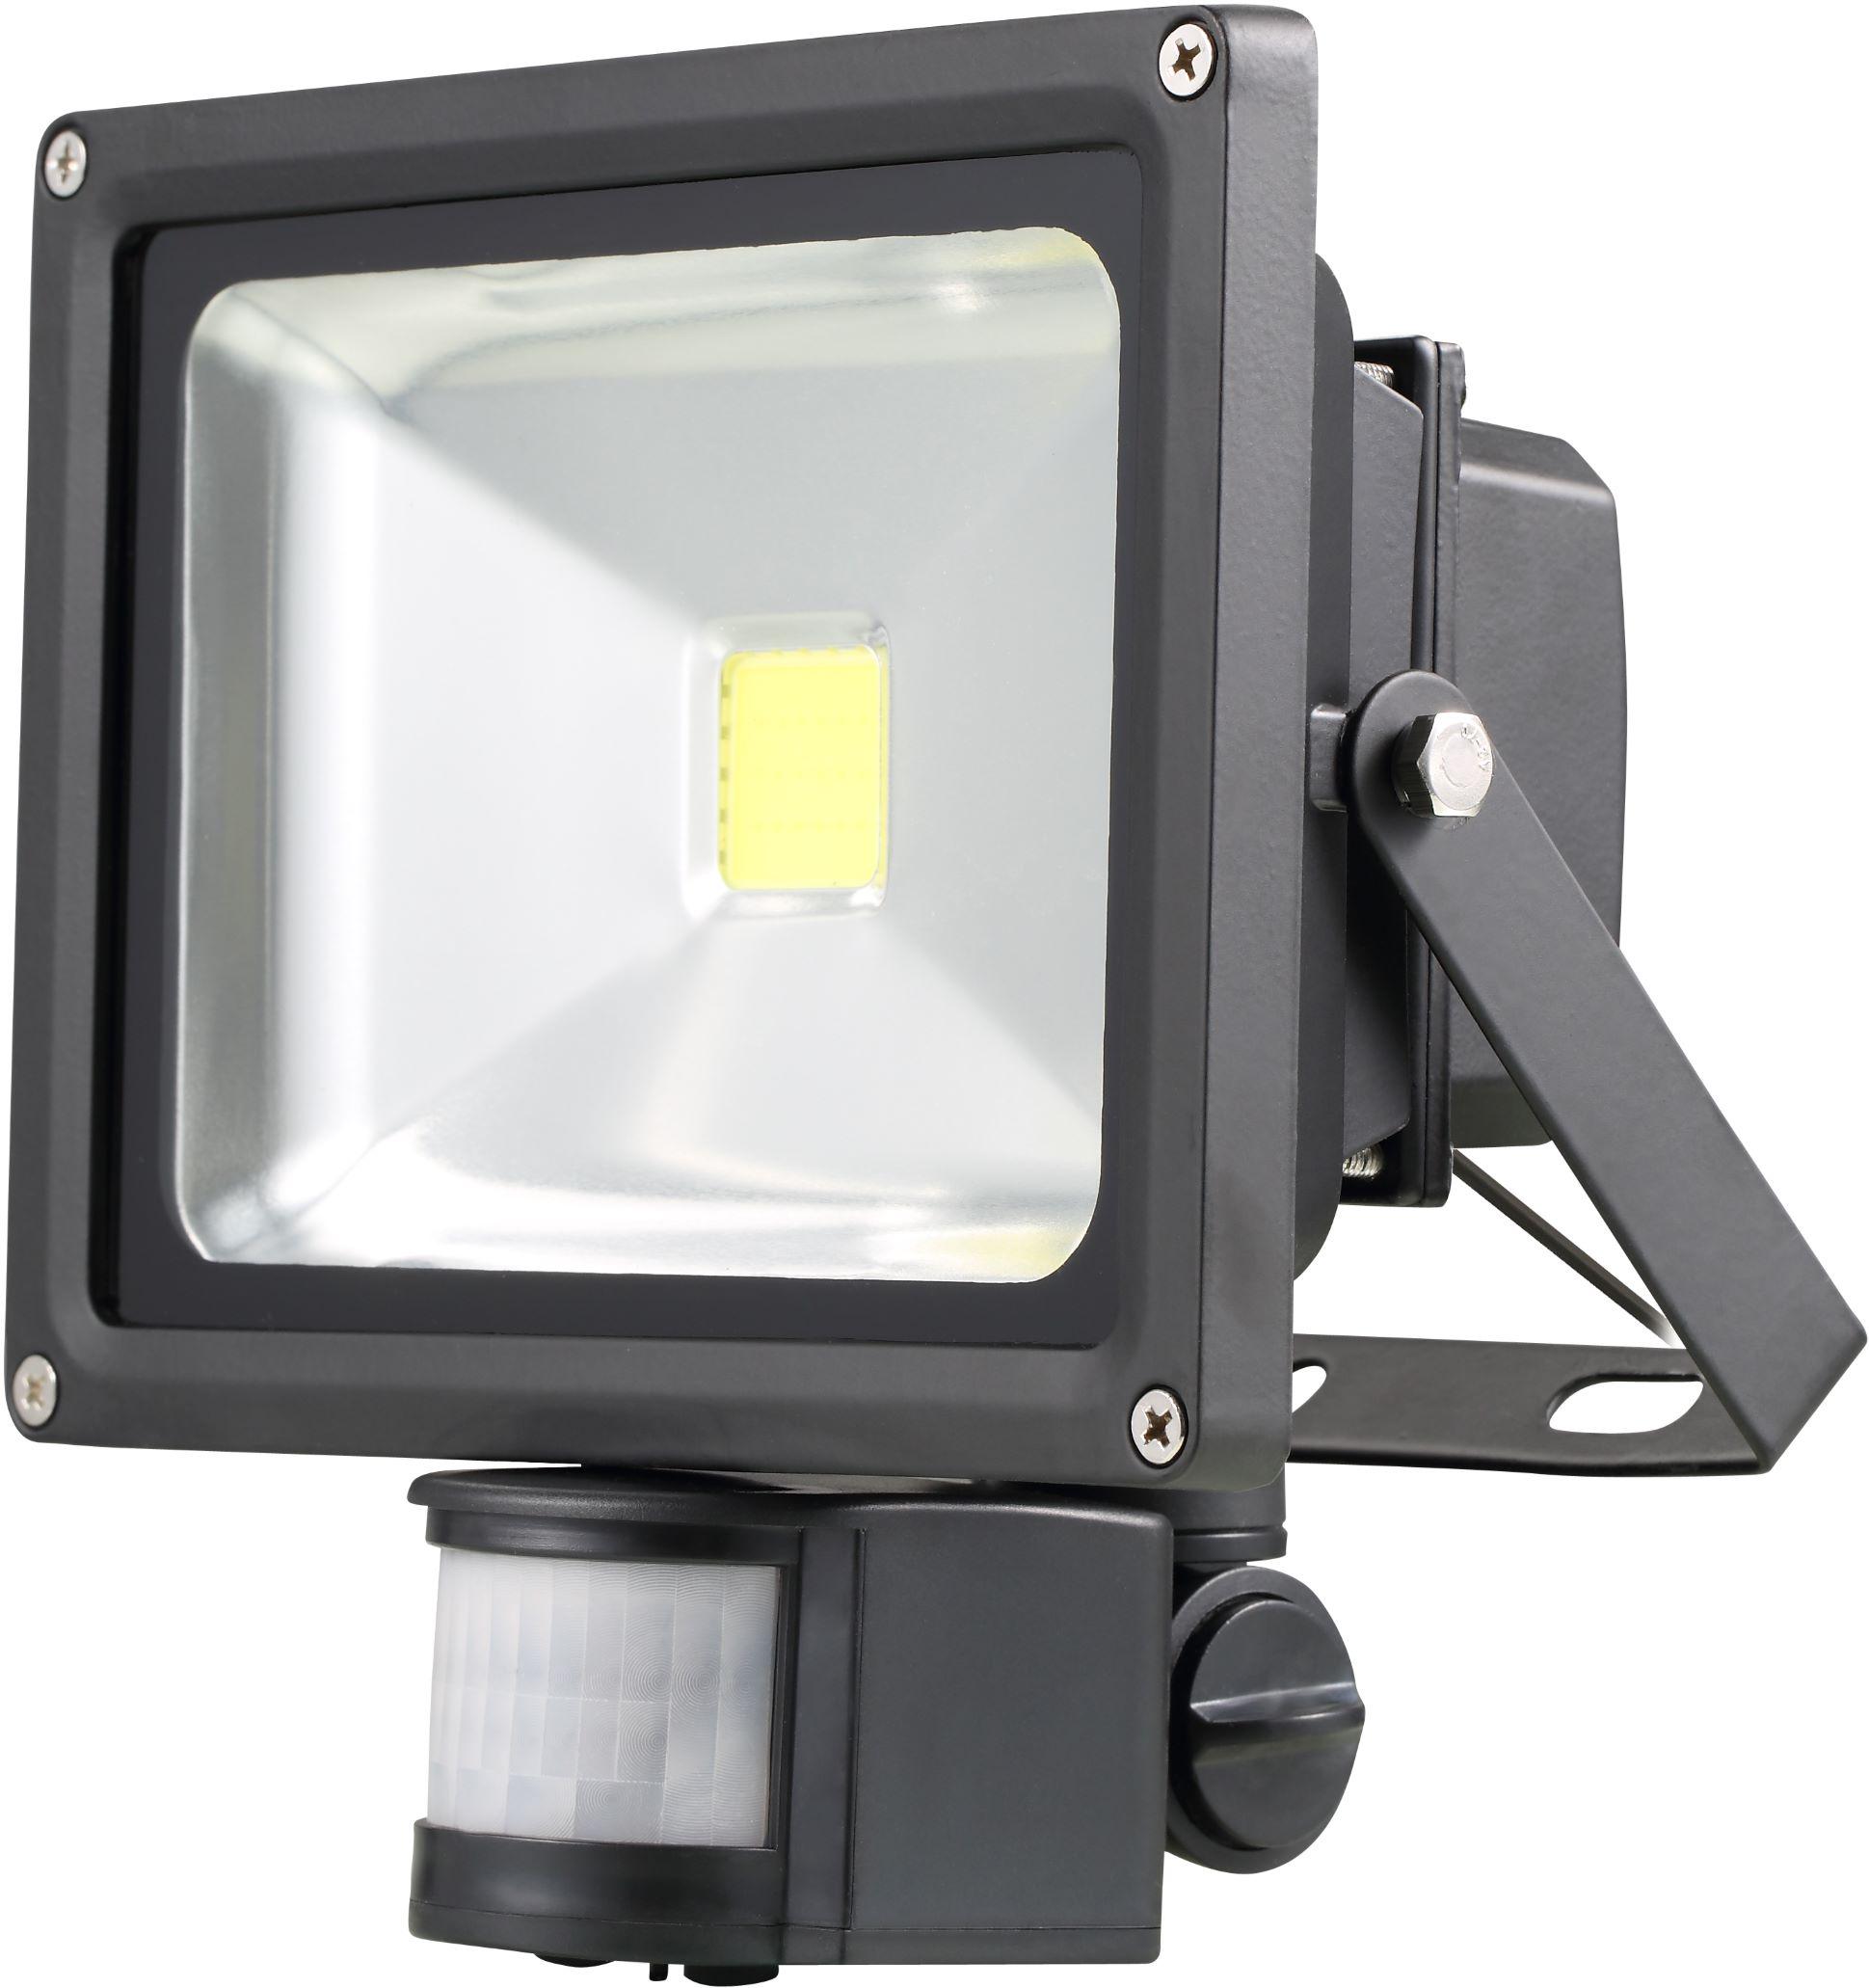 NORDRIDE 4066 Flutlichtstrahler 20W mit